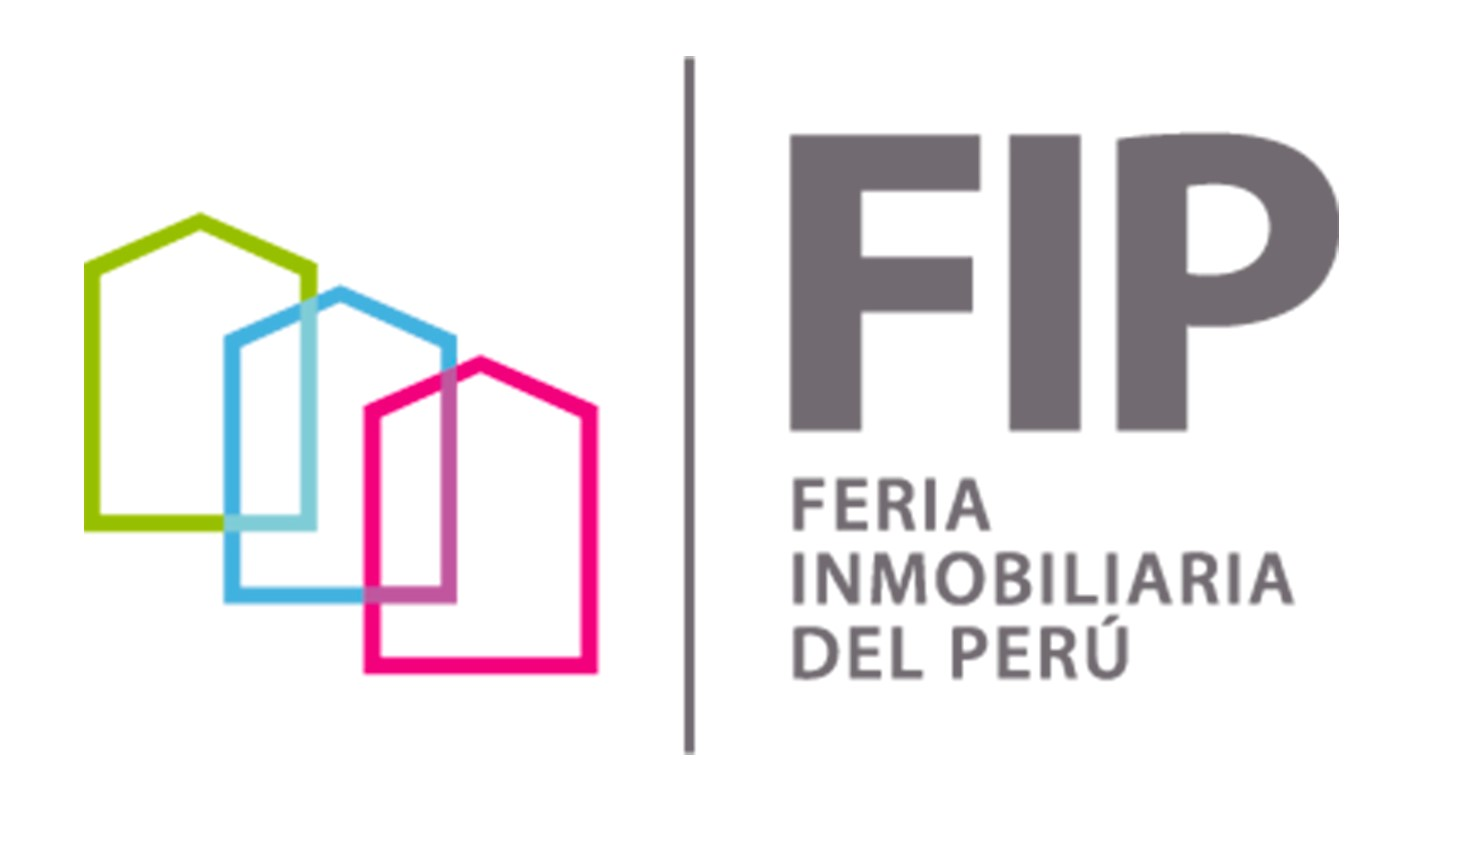 san-charbel-fip-feria-inmobiliaria